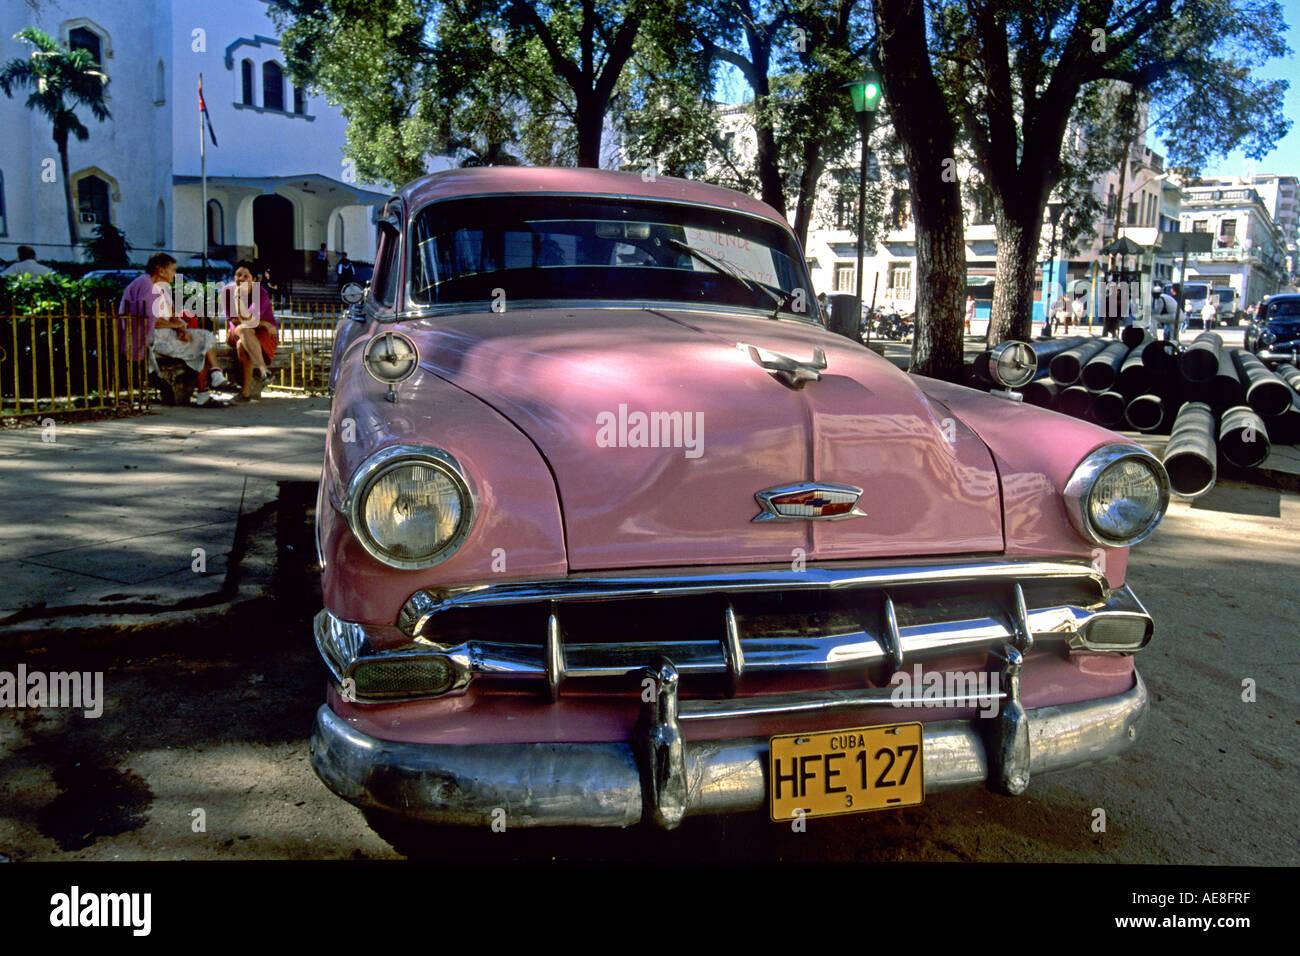 Old American car for sale Havana Cuba Stock Photo: 7773118 - Alamy